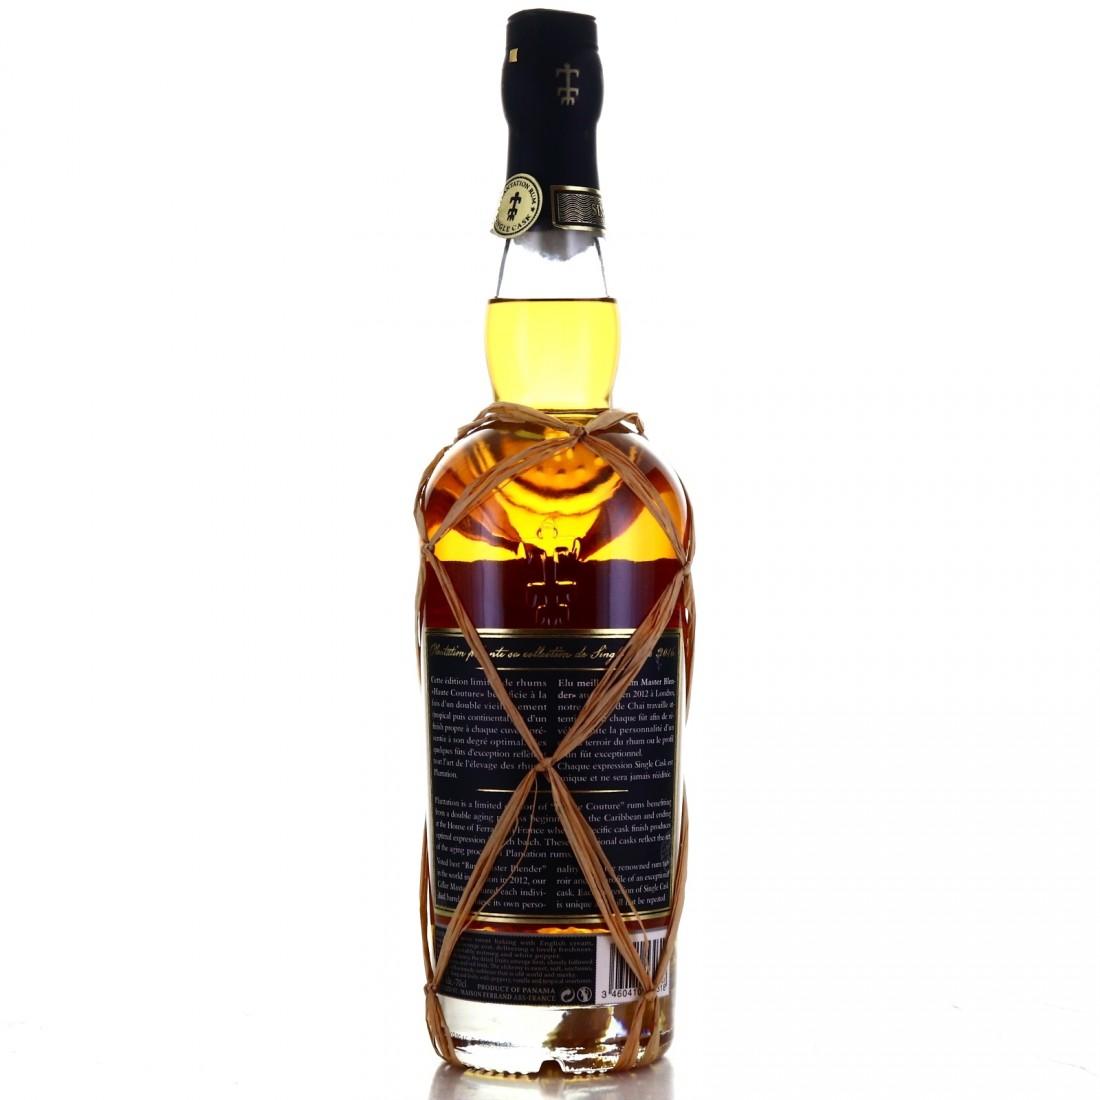 Panama Rum 2008 Plantation 8 Year Old Single Red Pineau Cask Finish #12